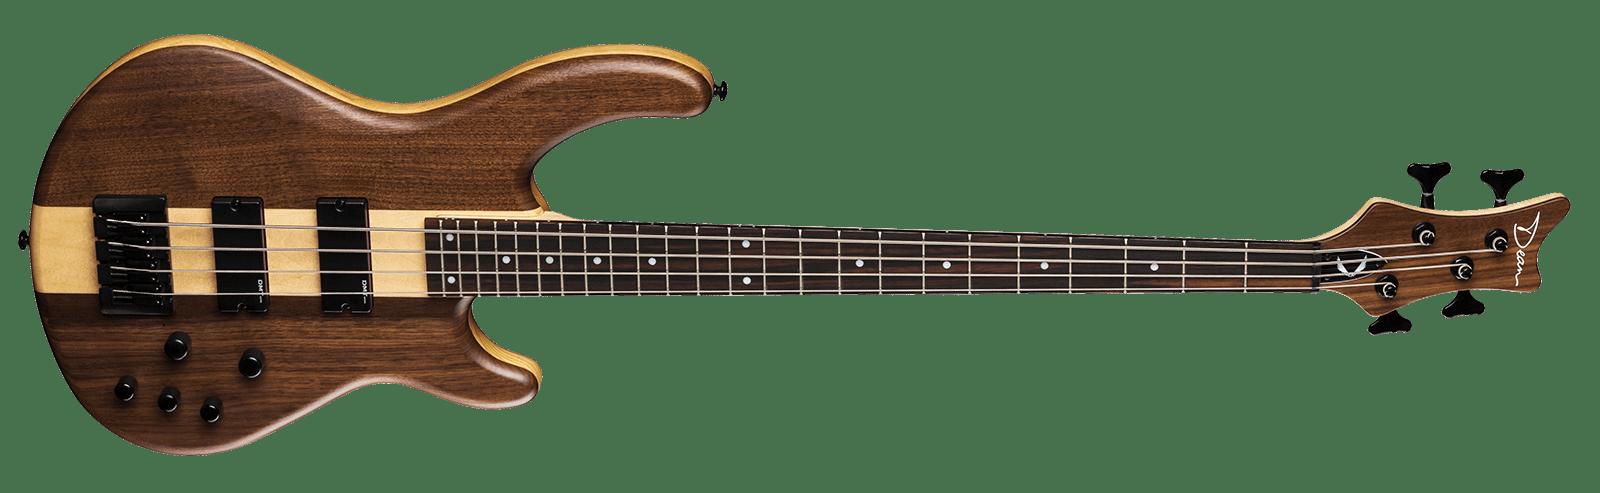 Edge Pro 4 String Walnut Satin Natural